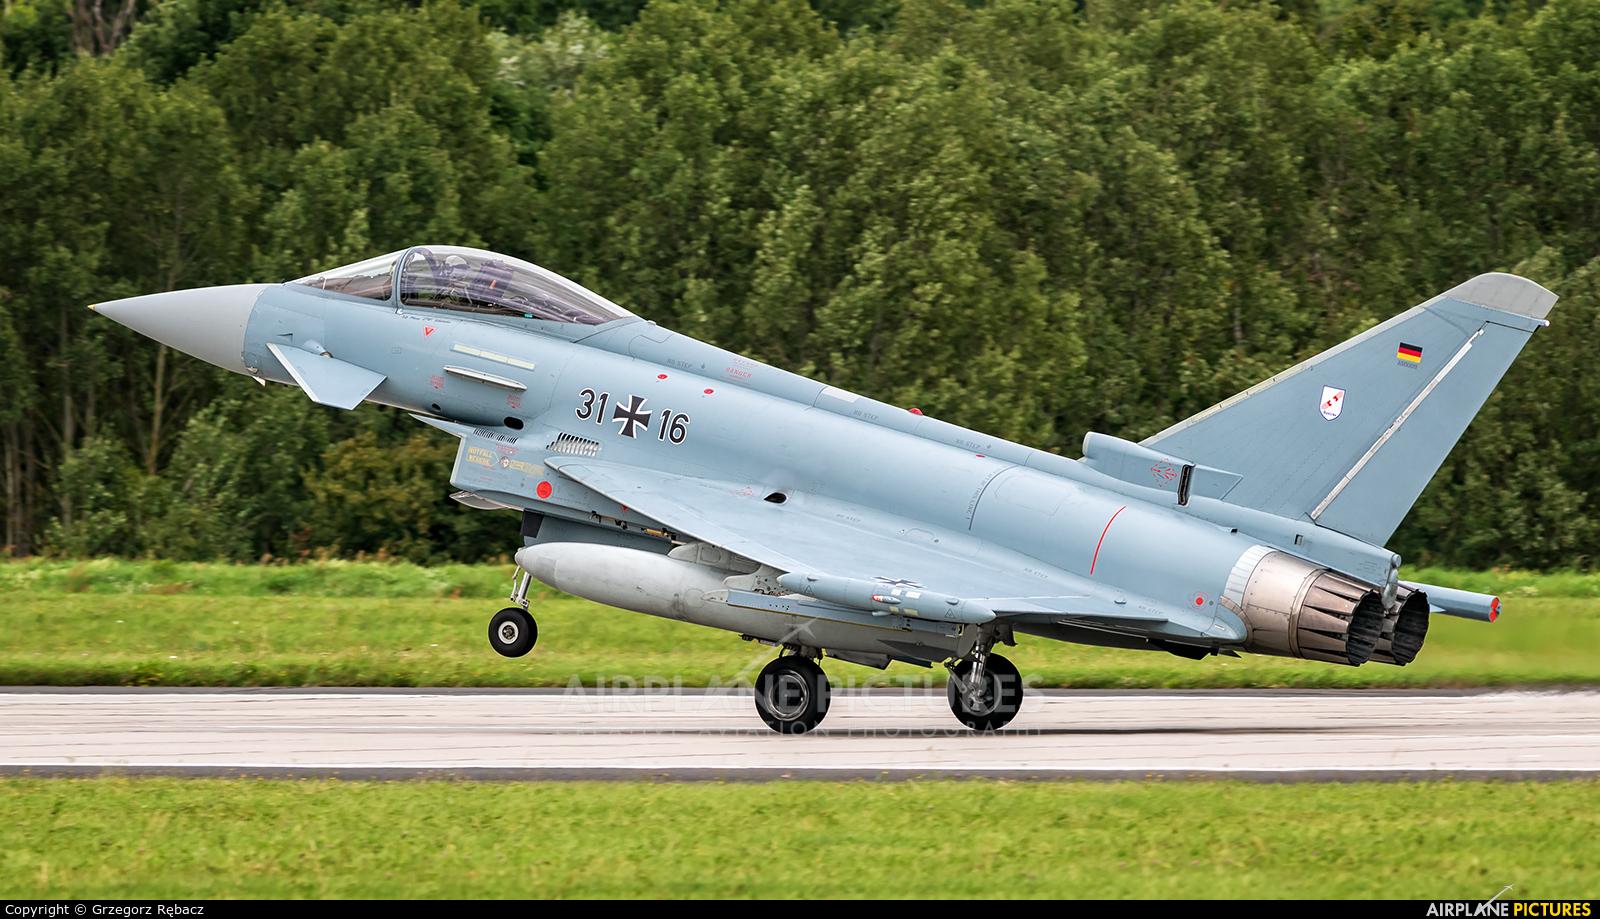 Germany - Air Force 31+16 aircraft at Gdynia- Babie Doły (Oksywie)